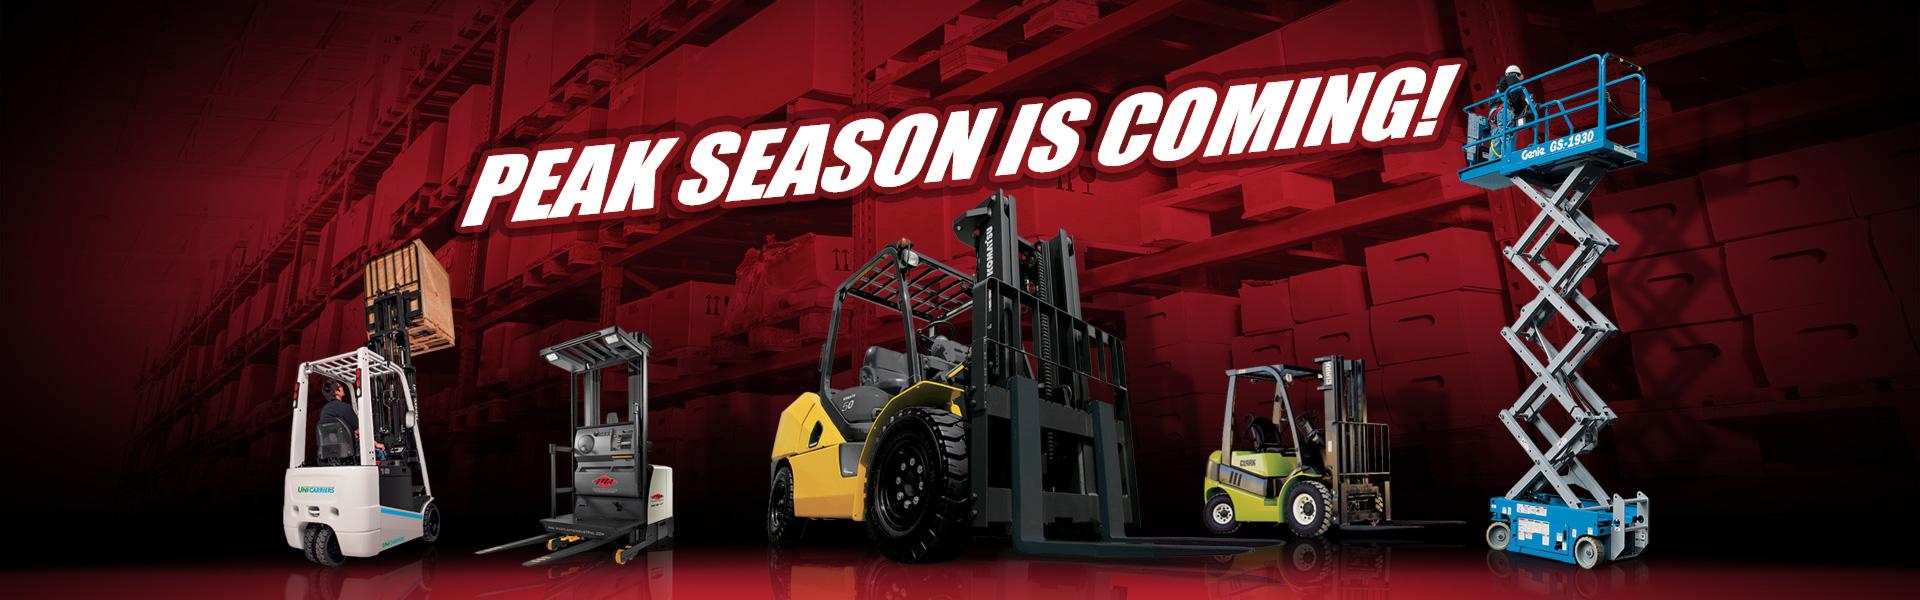 Peak Rental Season Is Coming For Forklifts & Material Handling Equipment